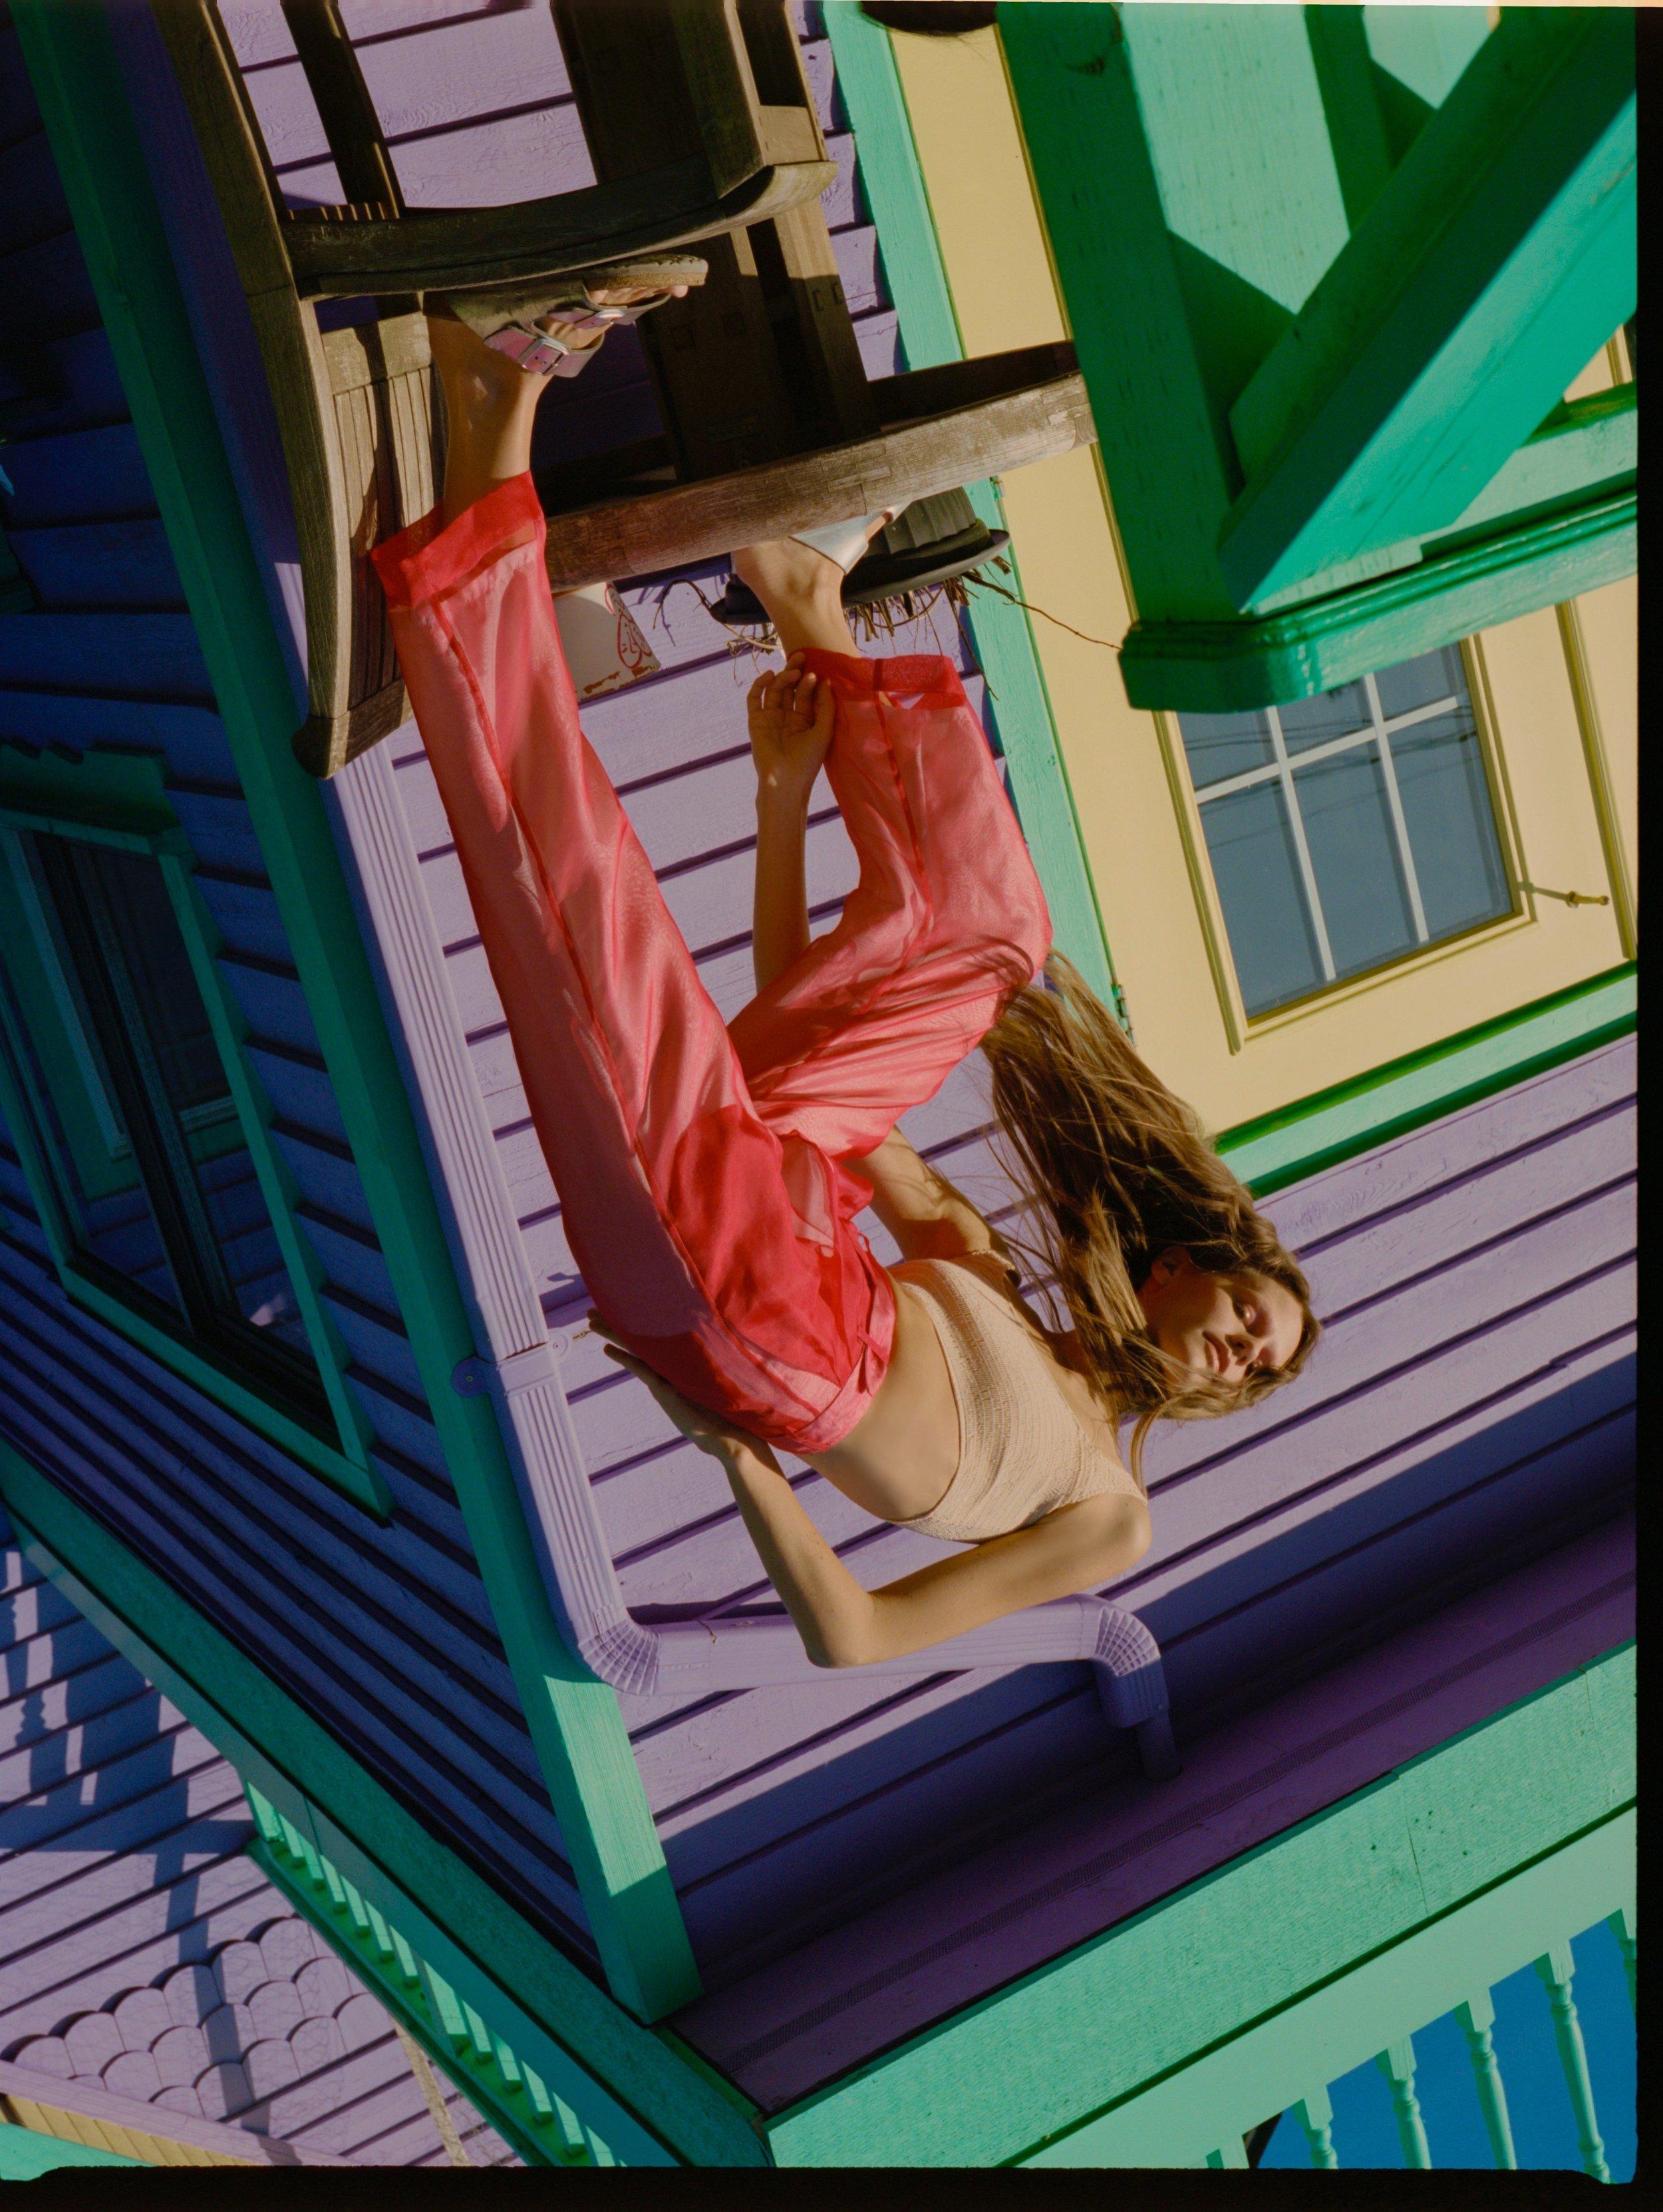 WRPD_Play House_upsidedown.jpg